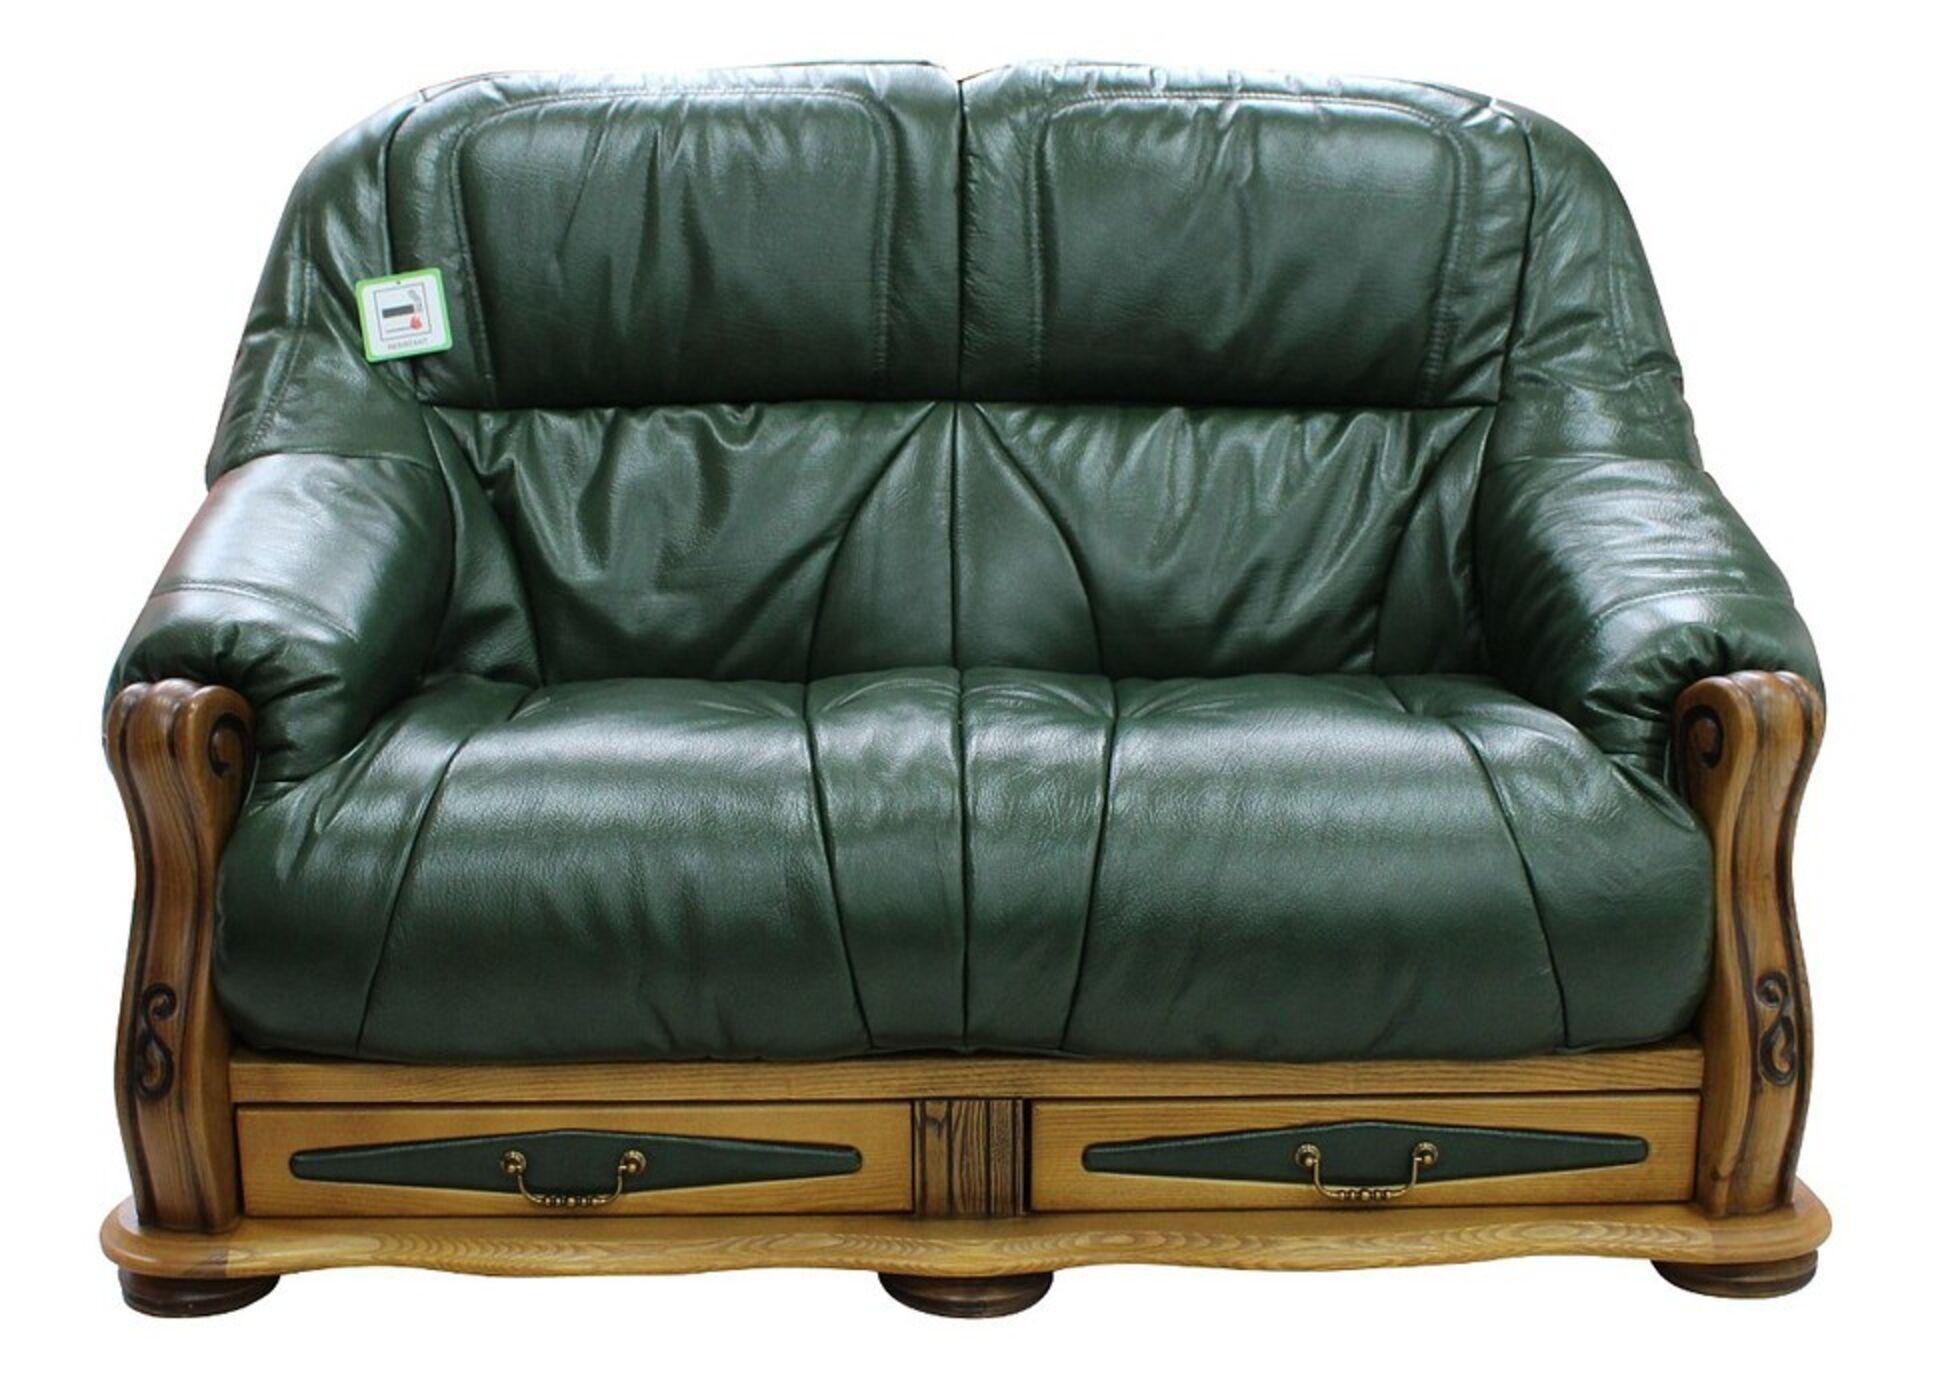 Merveilleux Belgium Storage Drawer Genuine Italian Leather 2 Seater Sofa Settee Green